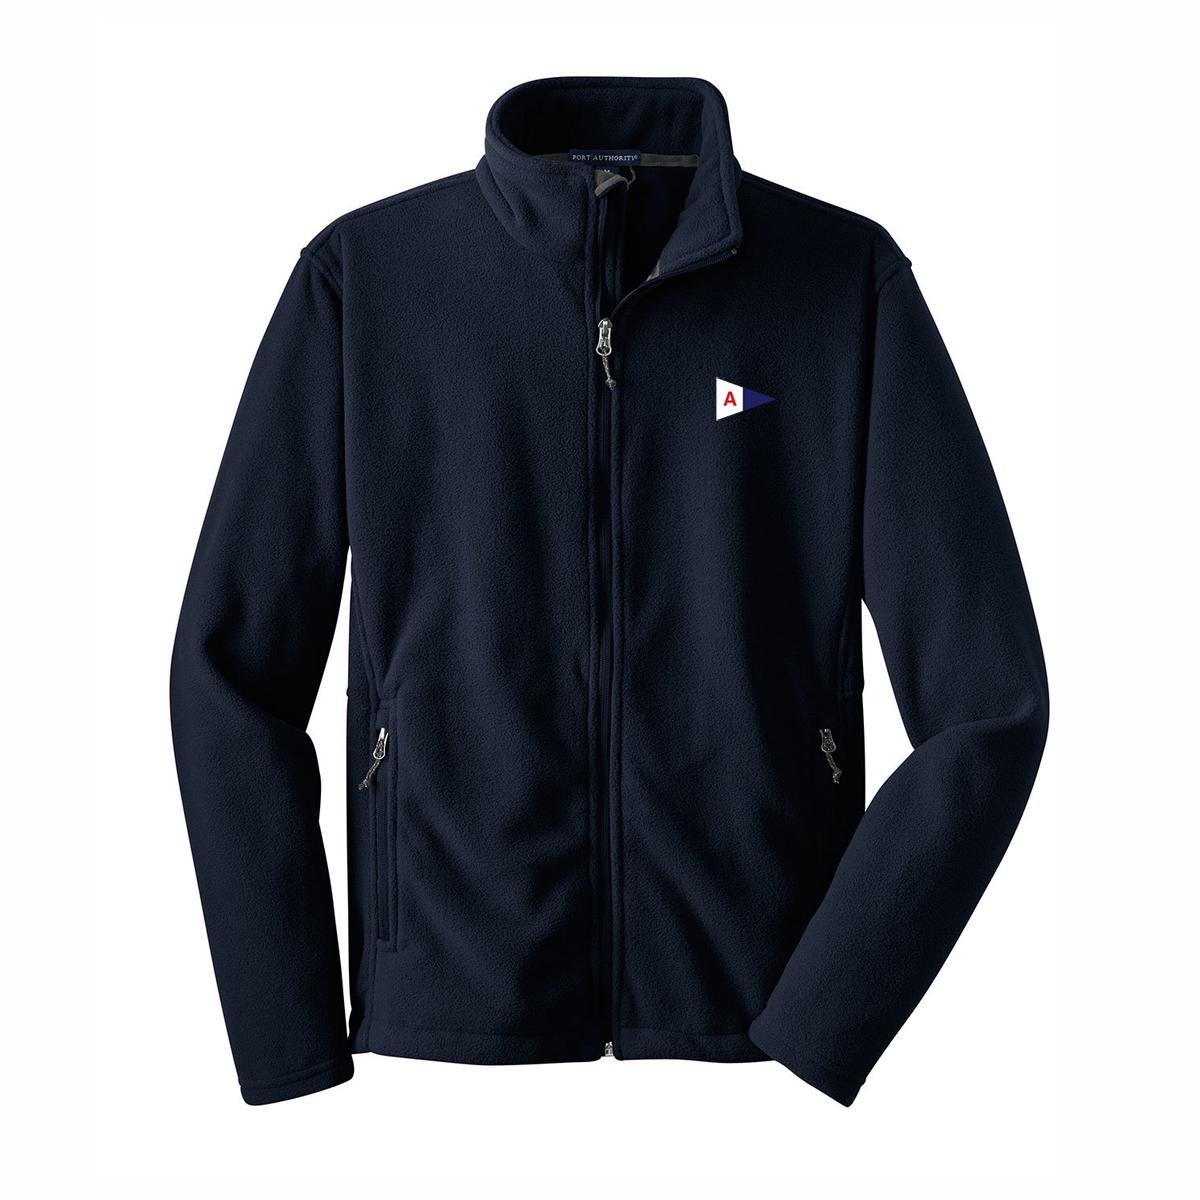 Arundel Yacht Club - Men's Value Fleece Jacket